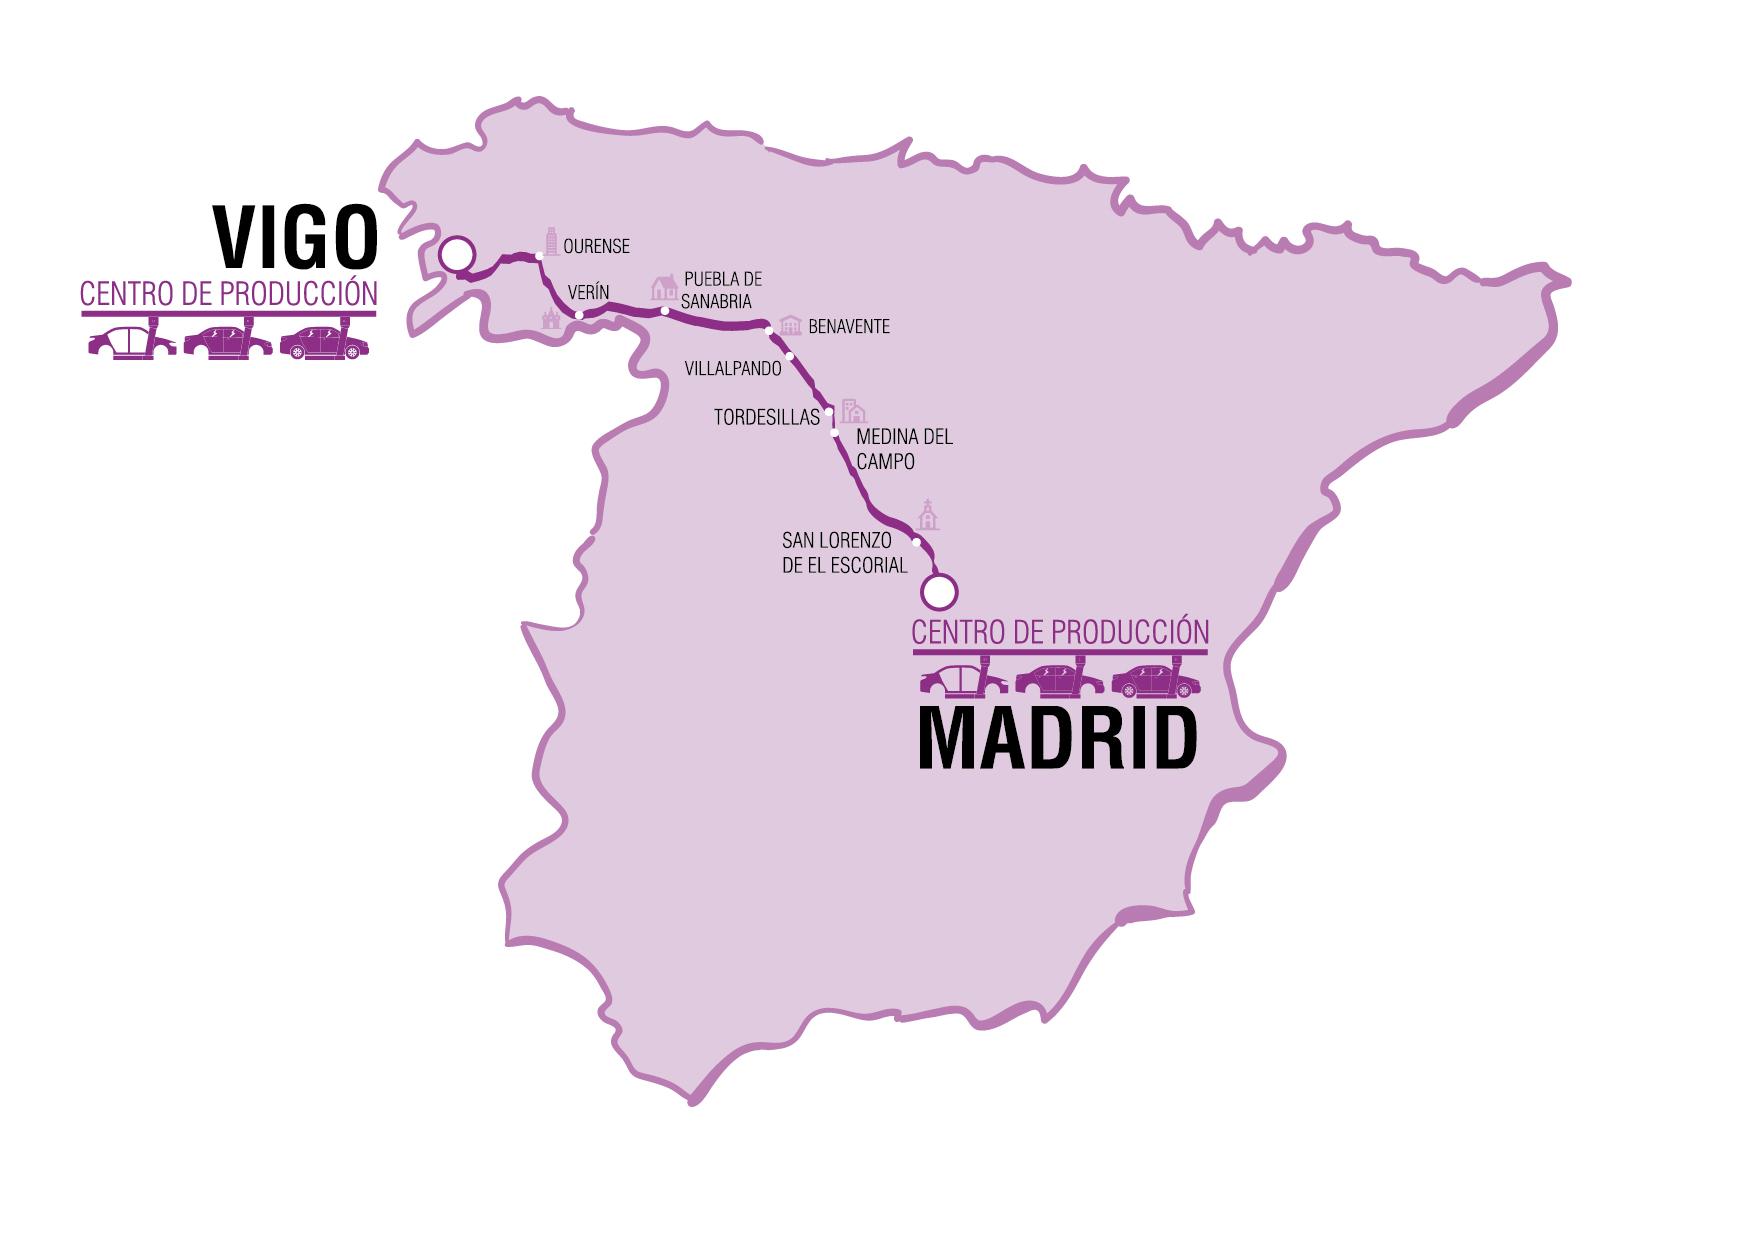 Ma ana un coche aut nomo de psa ir de vigo a madrid - Donde alojarse en galicia ...